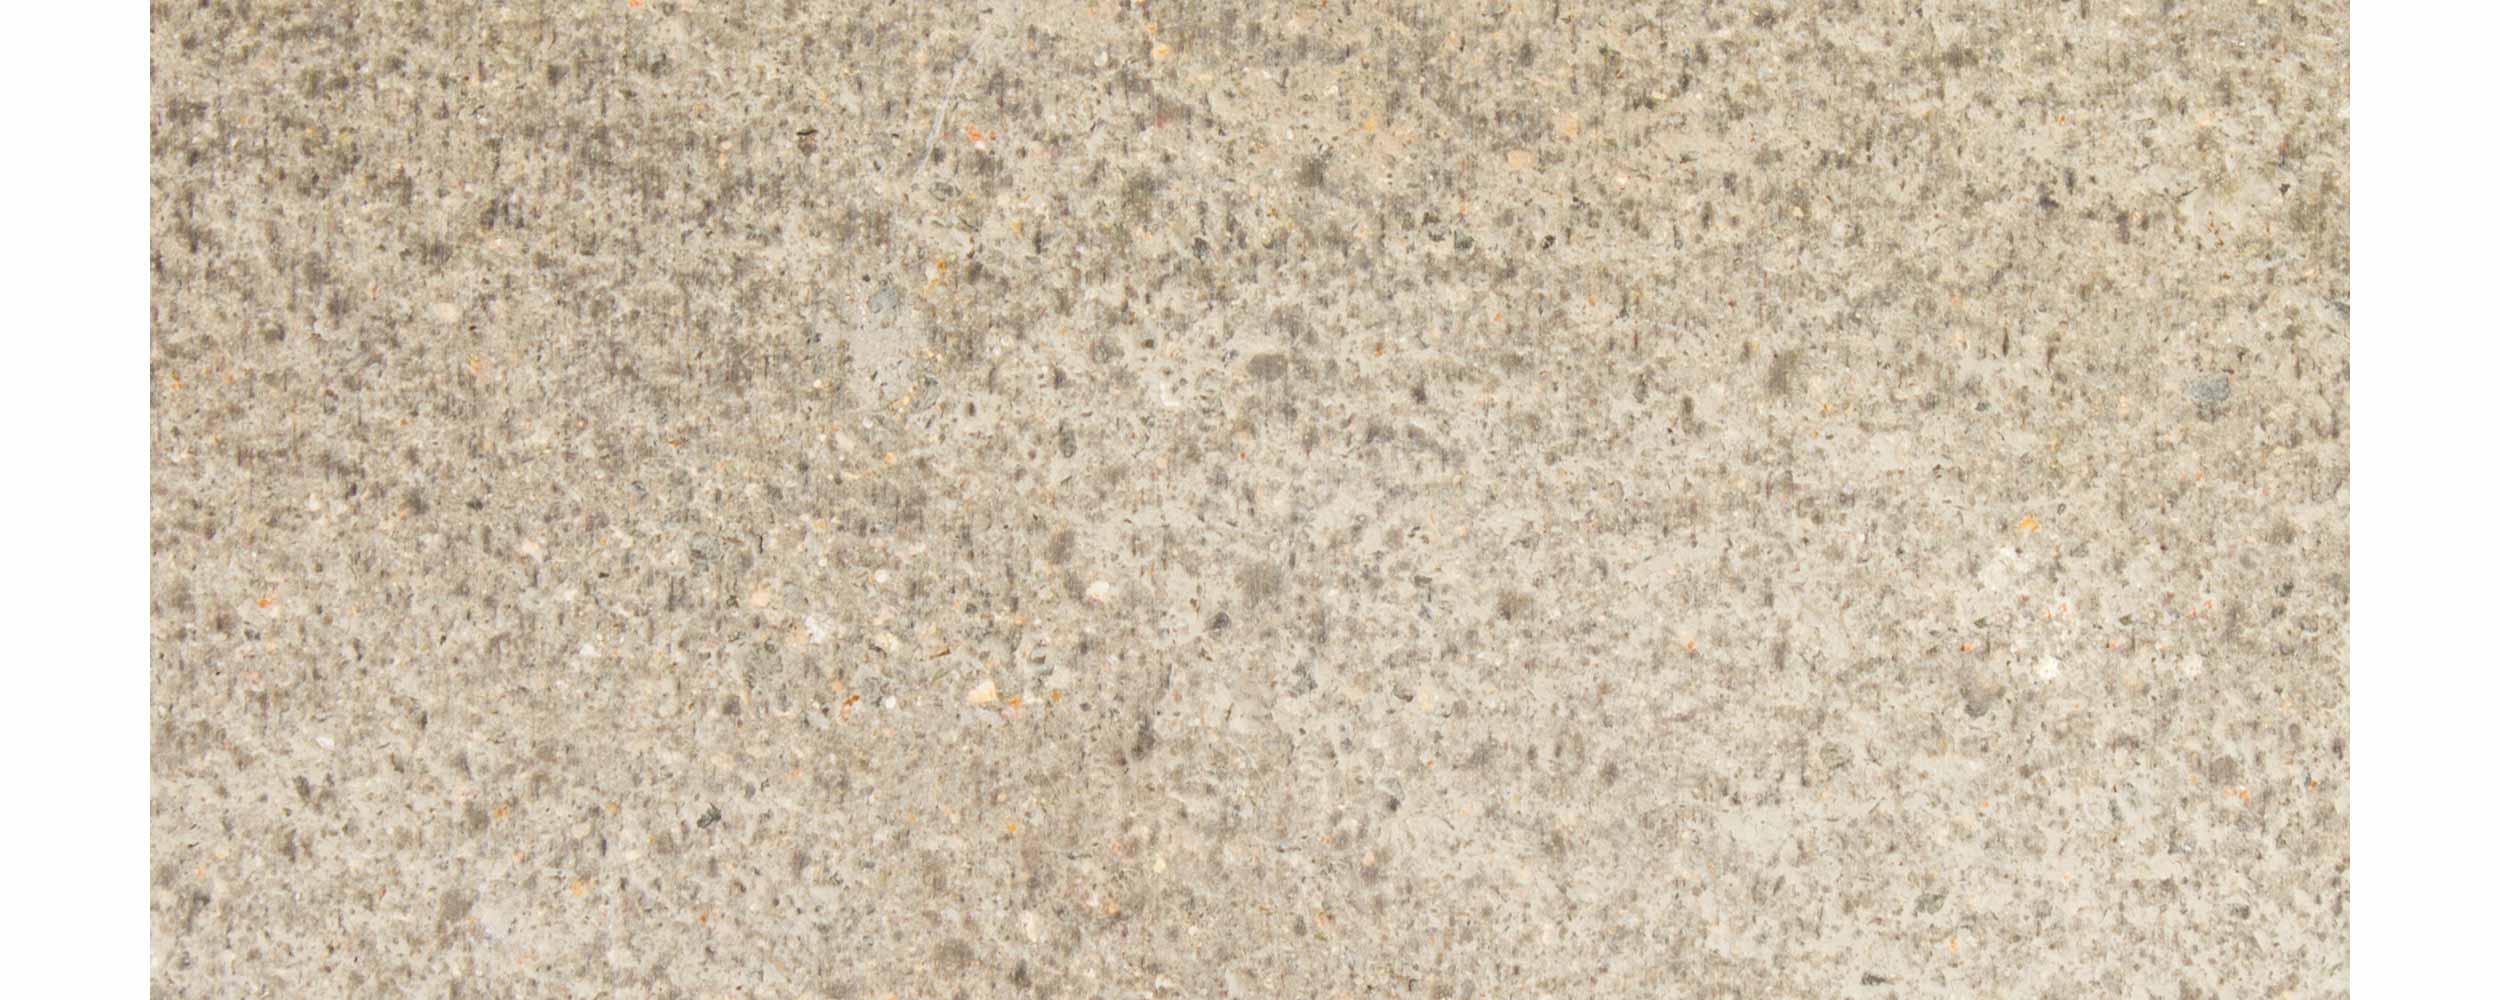 Watershed-Materials-Tan-Watershed-Block-1-2500.jpg